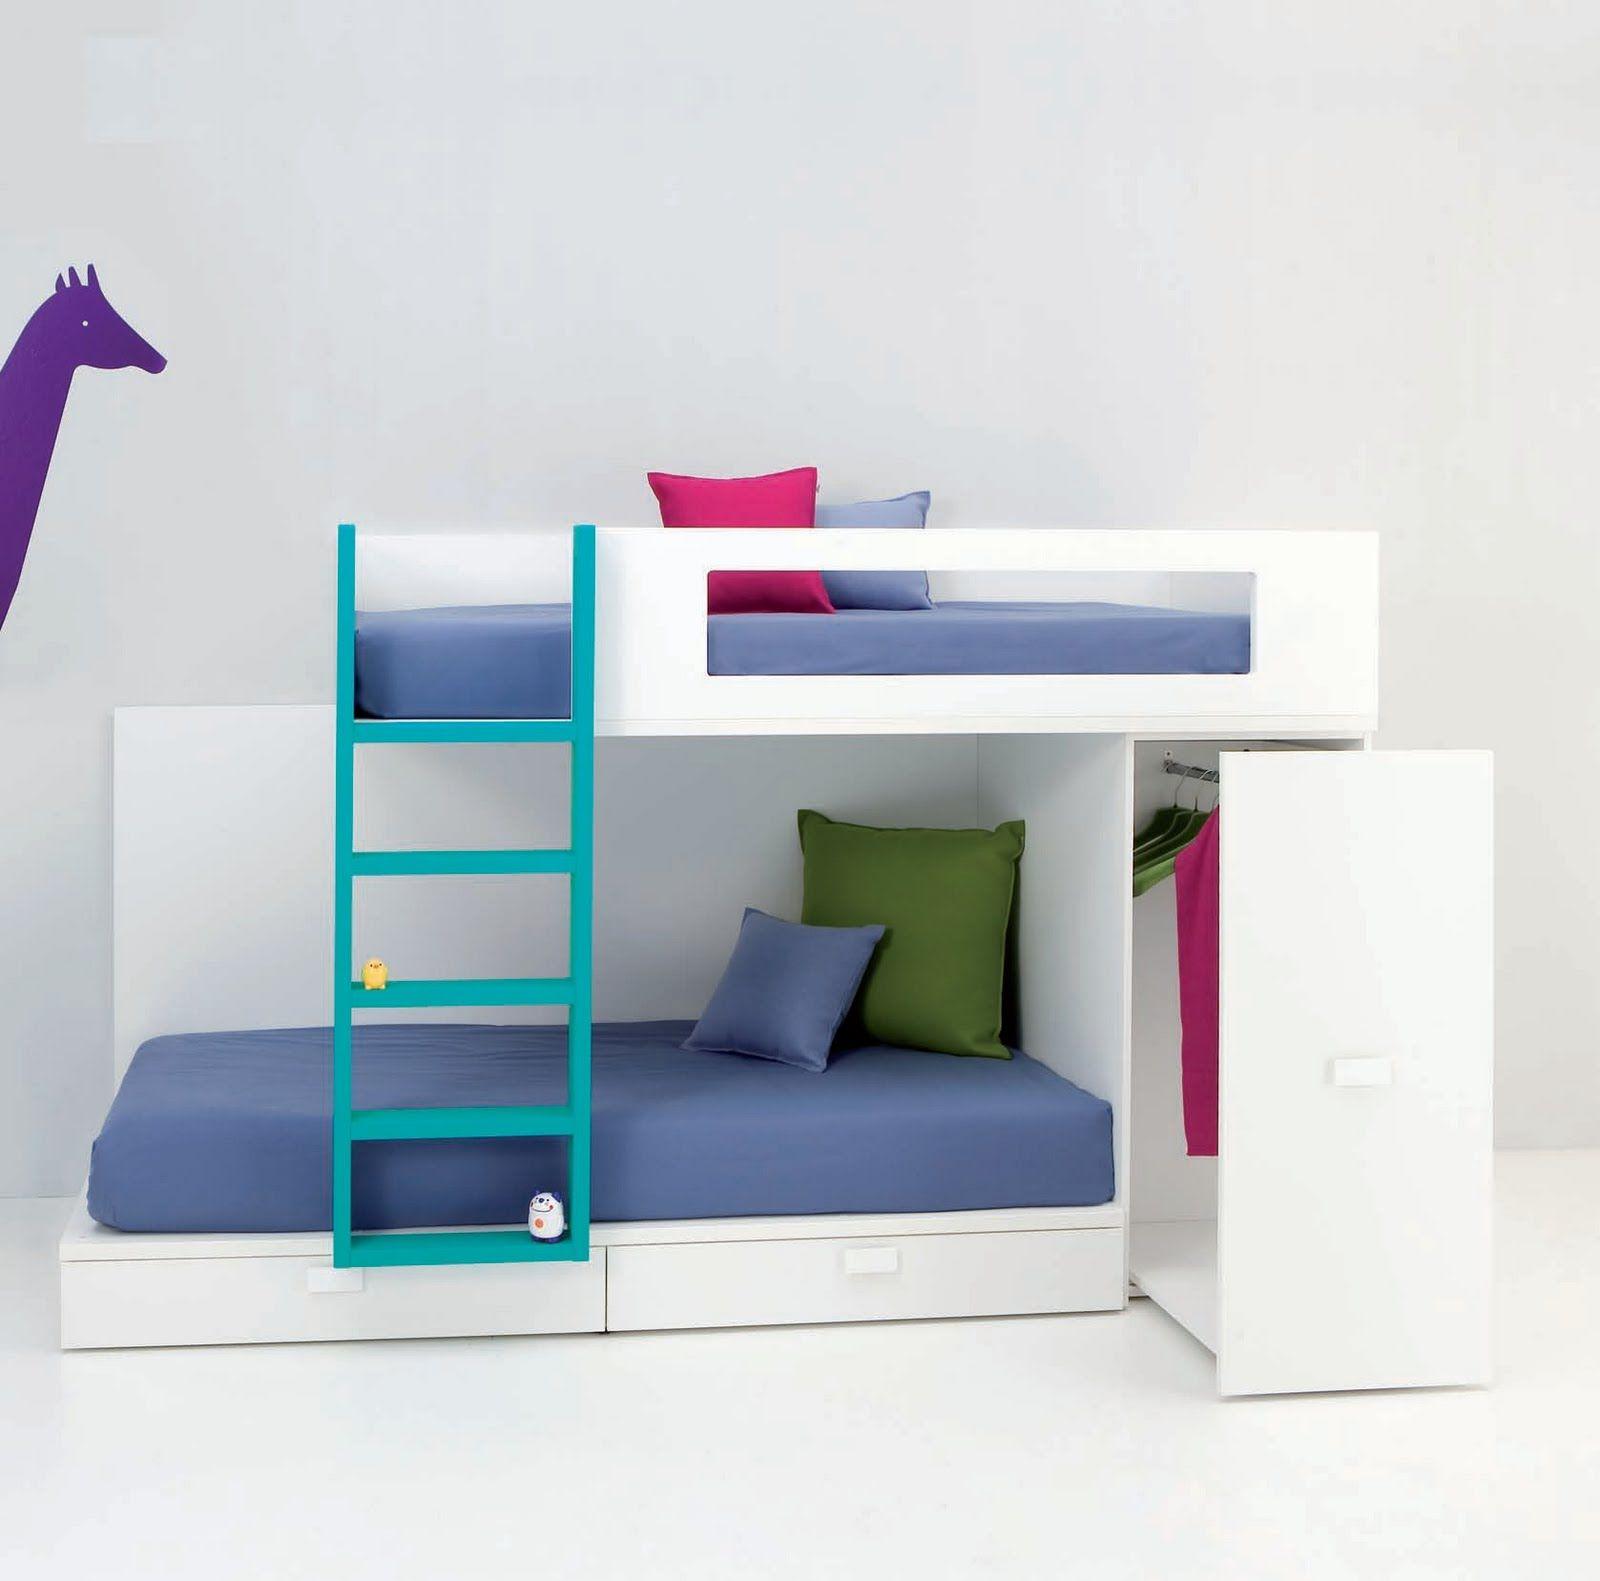 Muebles Literas Infantiles - Litera Tren Con Peque O Armario Dormitorios Ni Os Pinterest [mjhdah]http://www.cerilene.com/i/2017/08/literas-infantiles-dico-tren-baratas-ikea-coppel.jpg